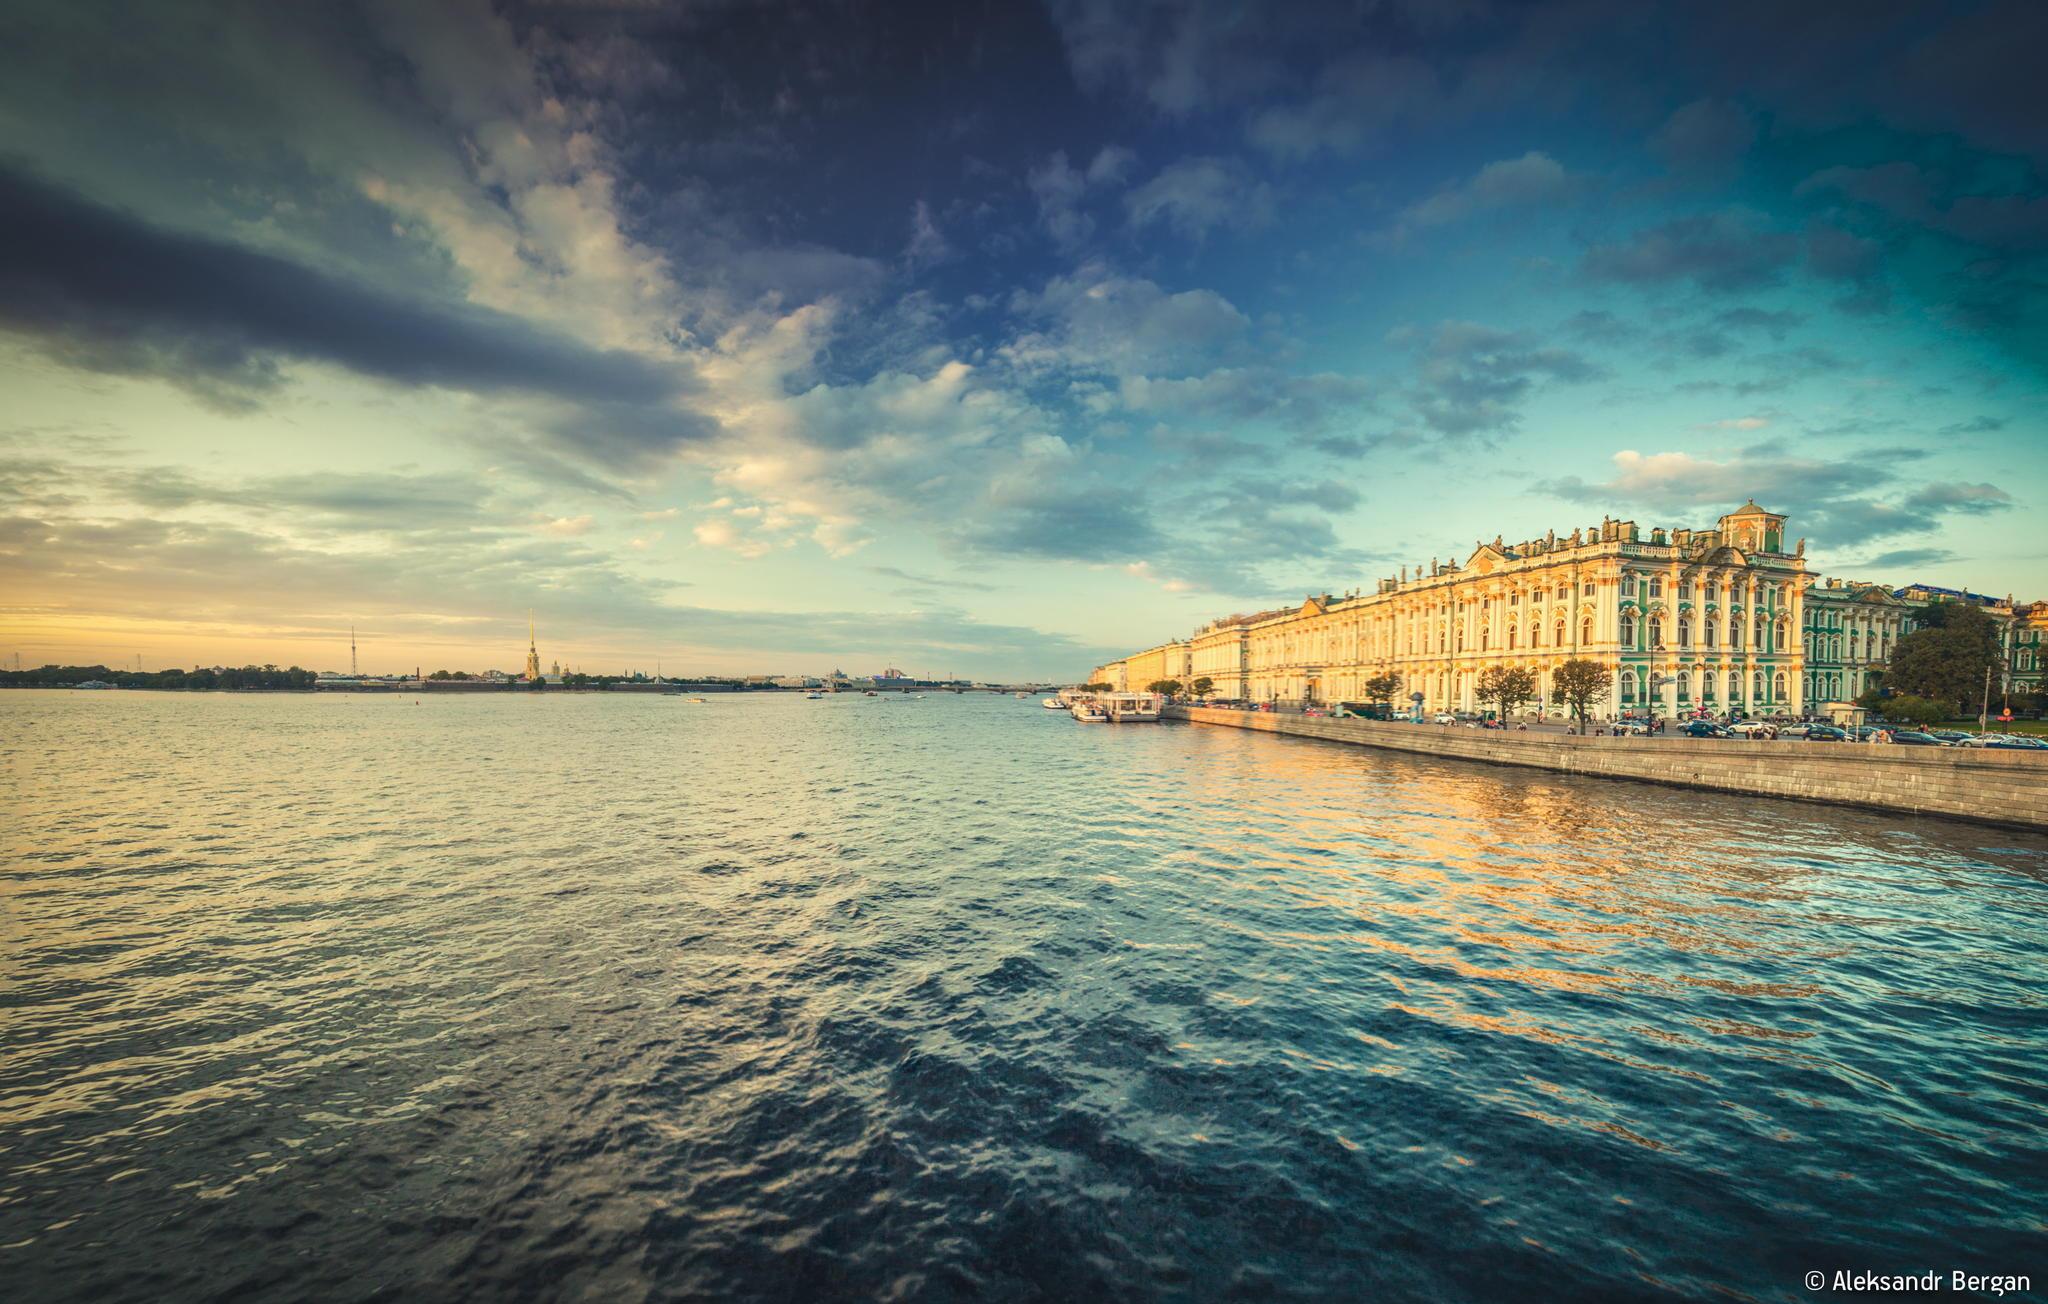 Man Made Saint Petersburg 2048x1304